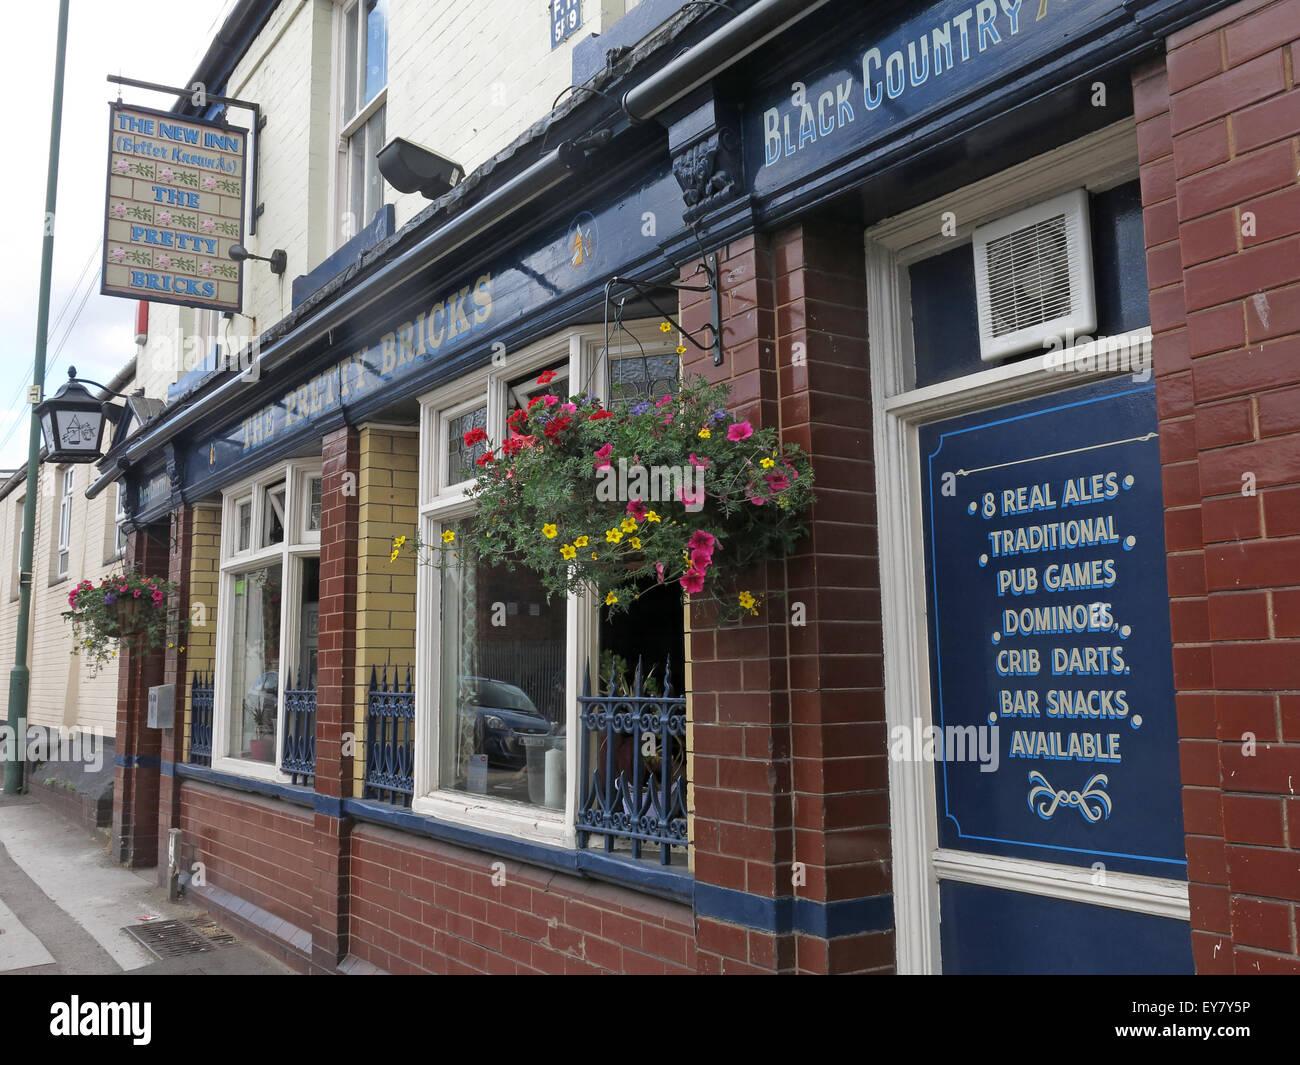 Black Country Ales Micro Brewery,the,new,inn,bar,Midlands,England,UK,BlackCountry,boozer,bars,alehouse,estate,CAMRA,beers,bitter,blond,john,st,street,New Inn,Pub estate,5 John St,GoTonySmith,Black,Country,Buy Pictures of,Buy Images Of,Black Country,Walsall Black Country